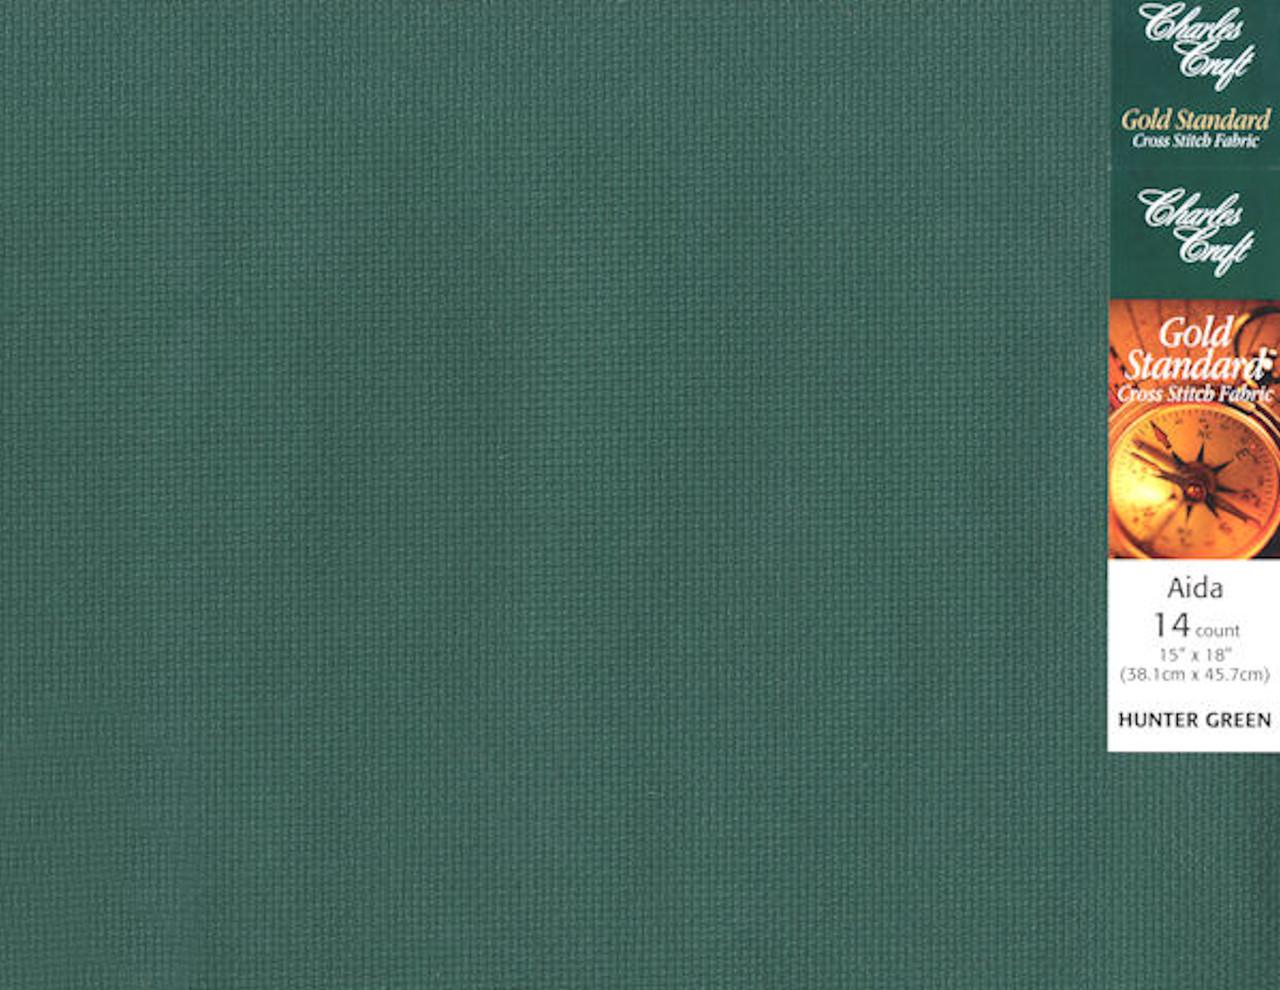 Charles Craft - 14 Ct Hunter Green Aida 15 x 18 in